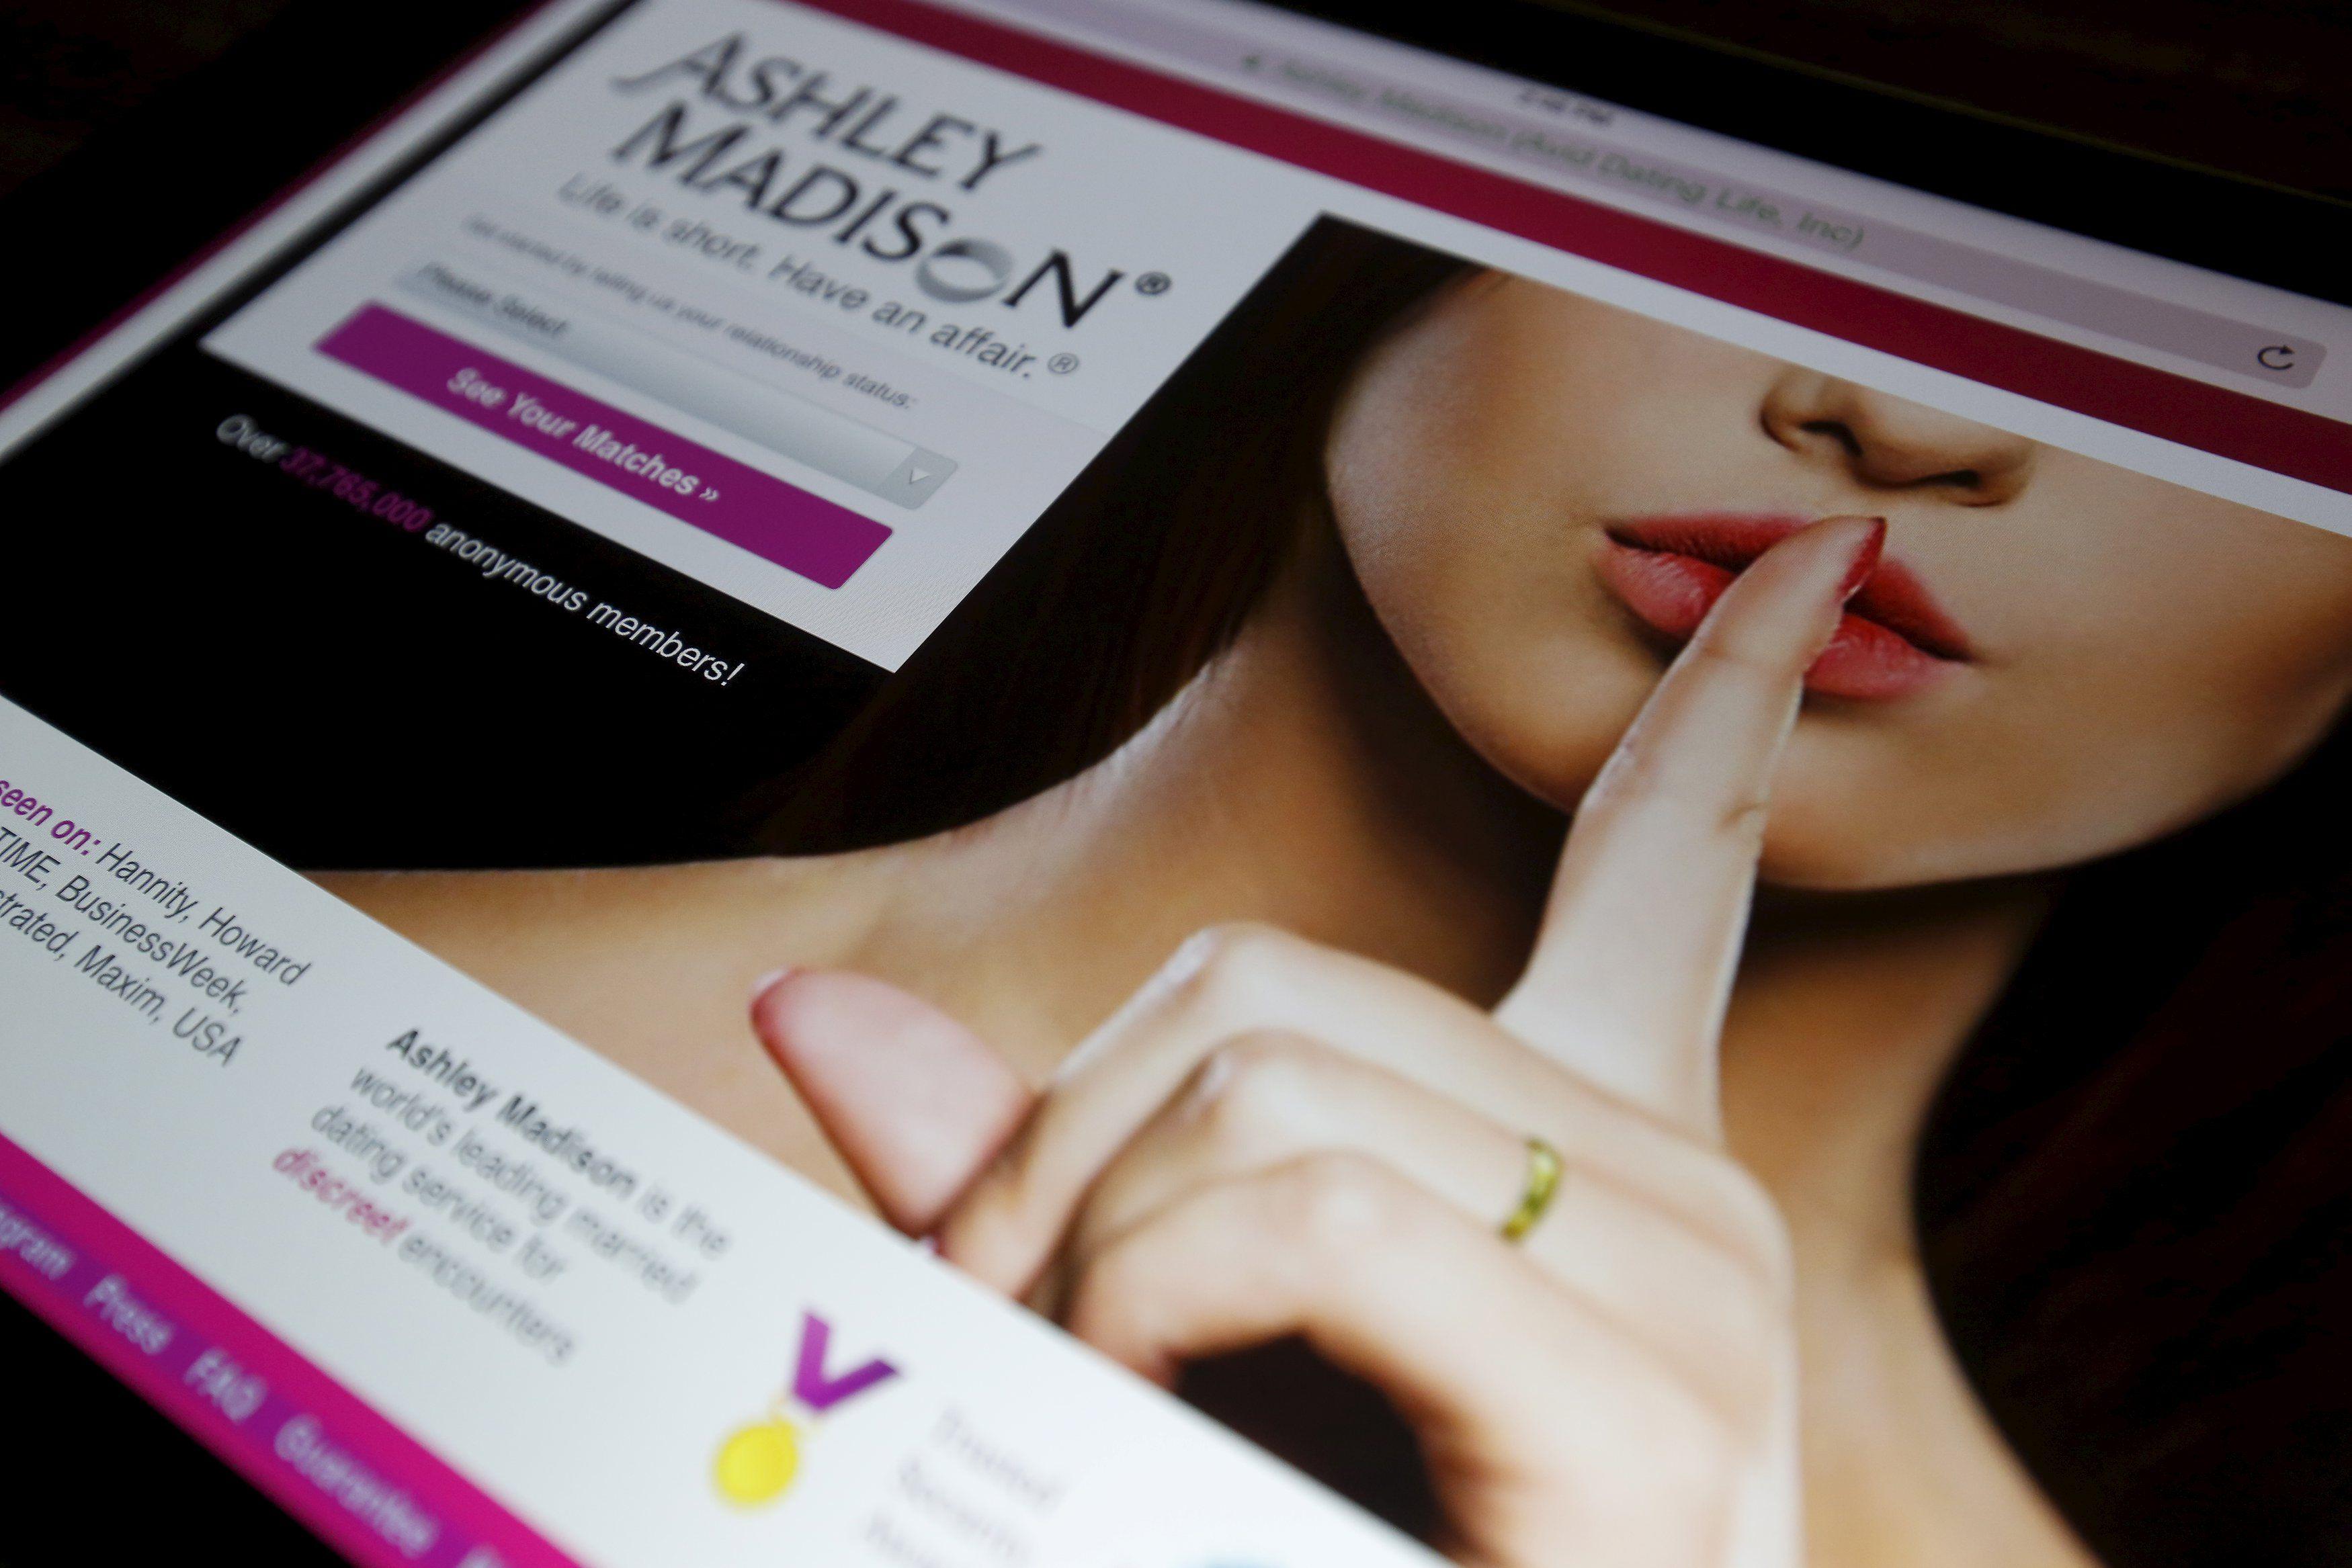 Online Affair Website - Ashley Madison